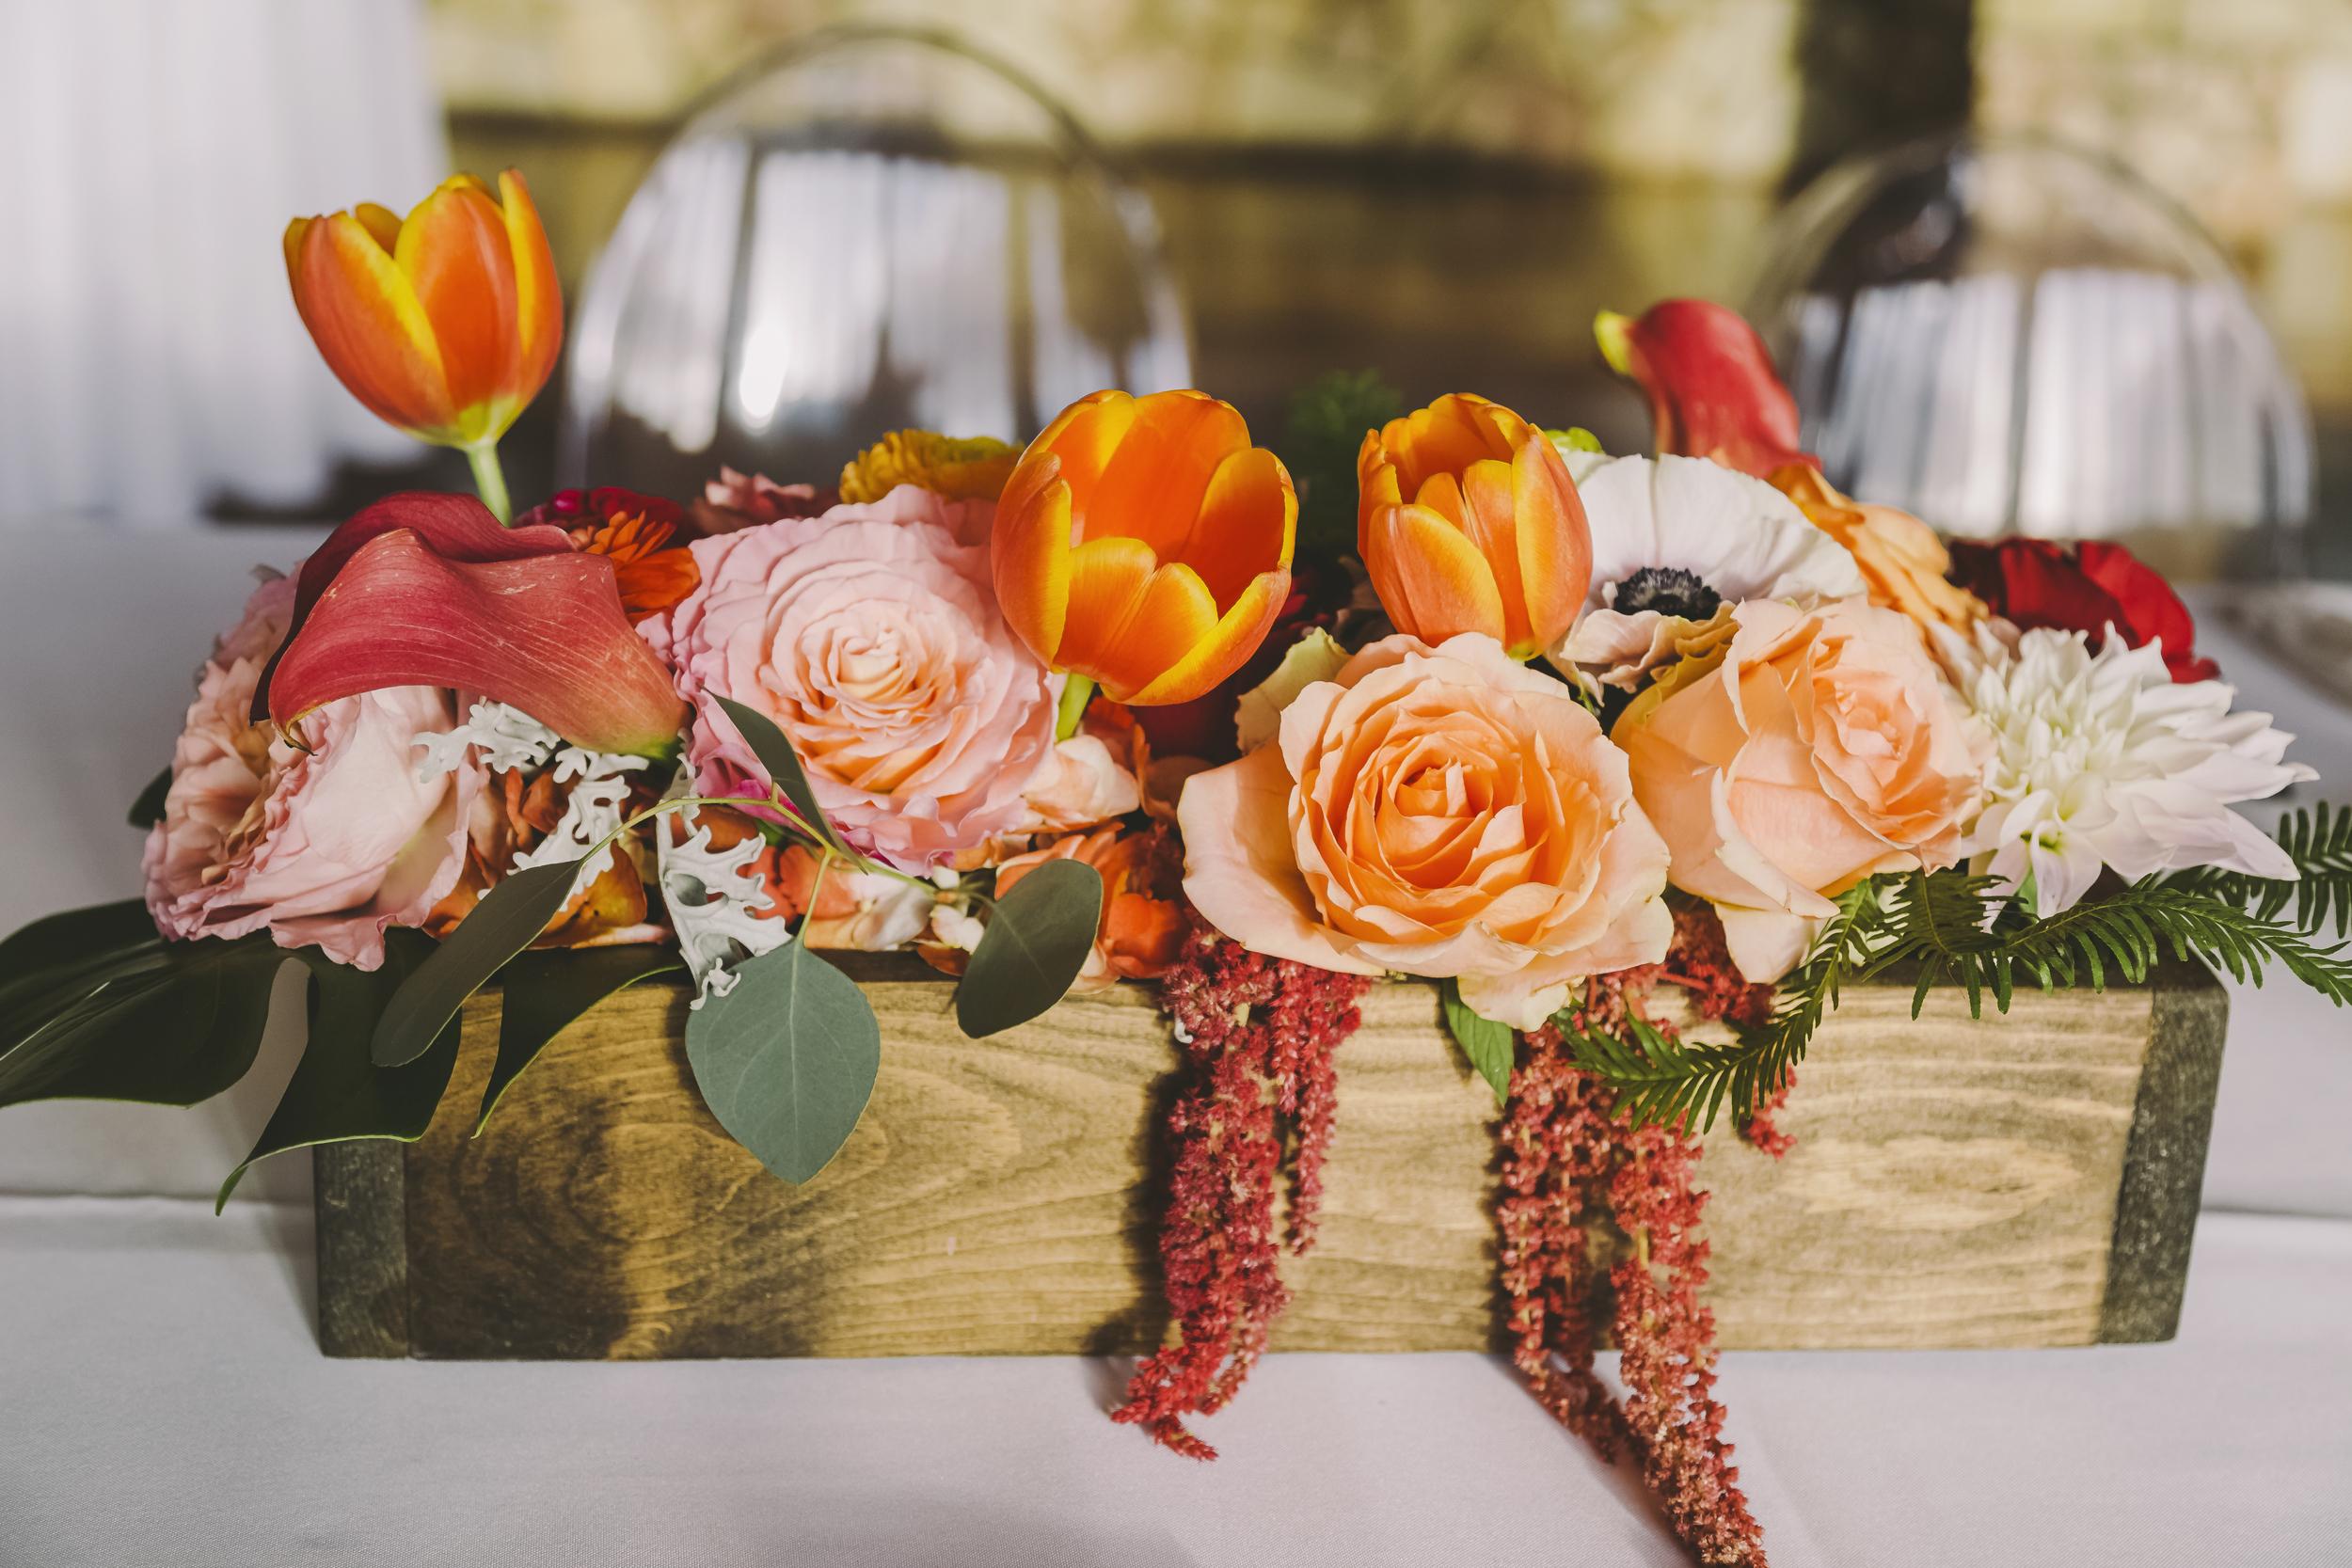 angie-diaz-photography-maui-wedding-mel-matt-84.jpeg